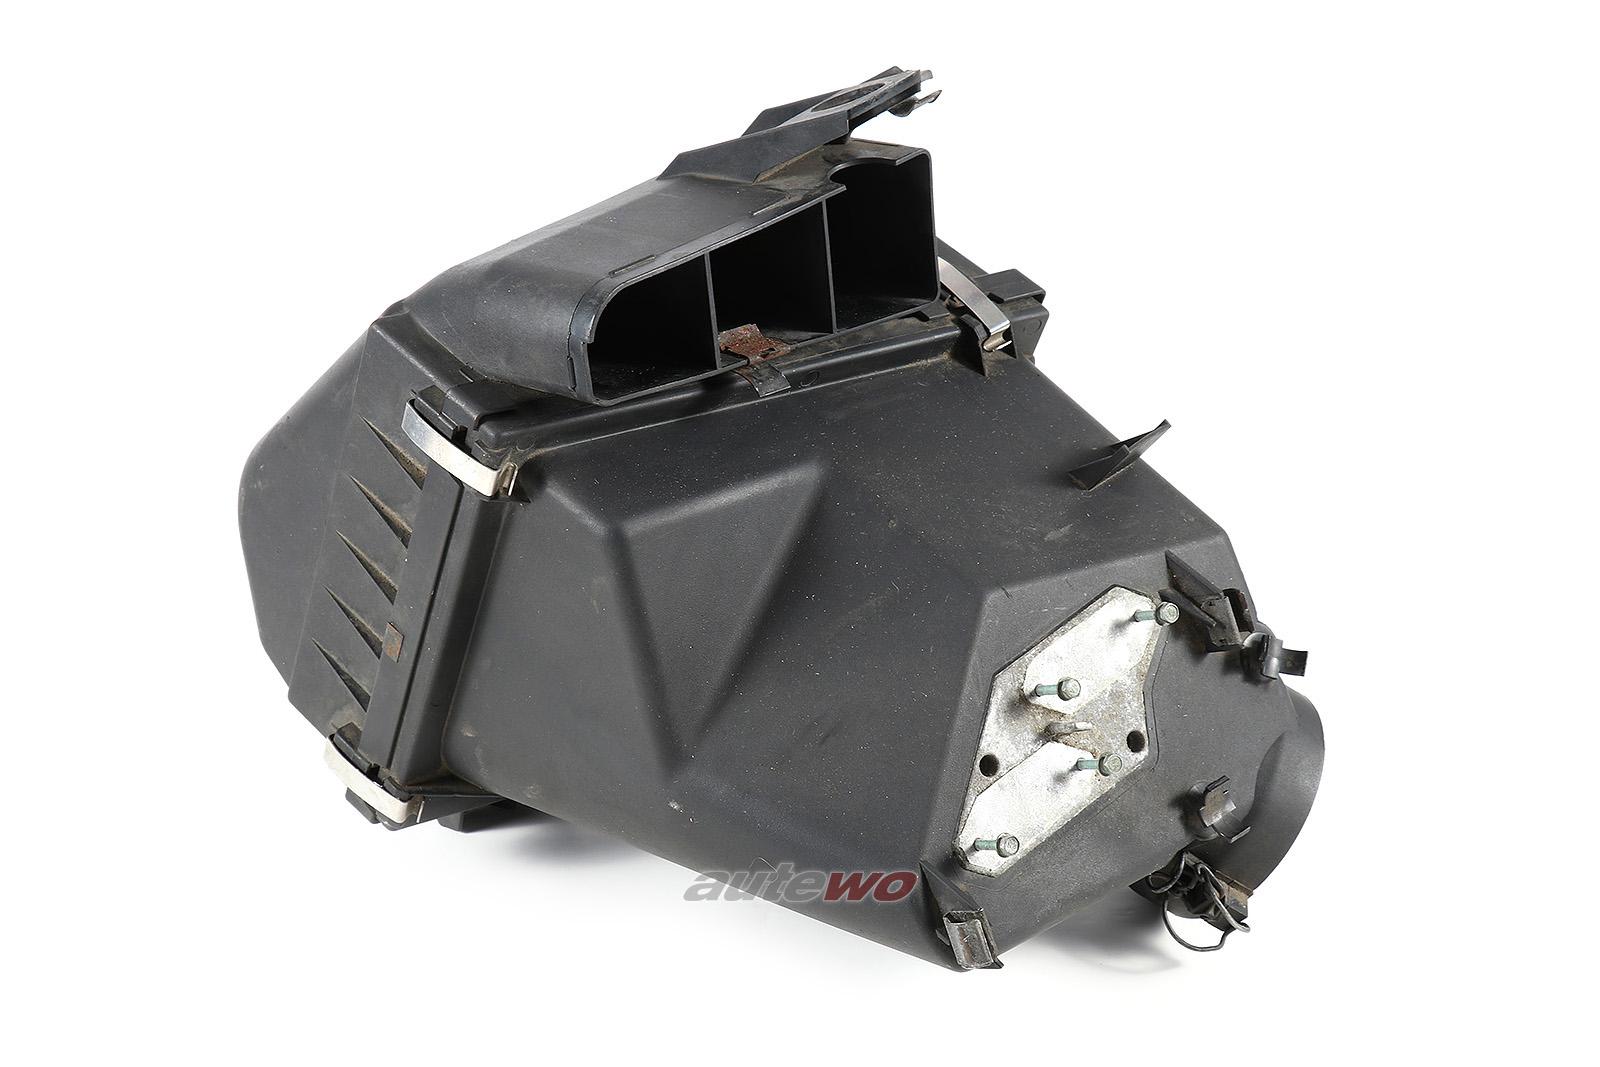 078133837AK Audi A6 4B 2.7l Biturbo 6 Zylinder AZA/AJK/ARE Luftfilterkasten